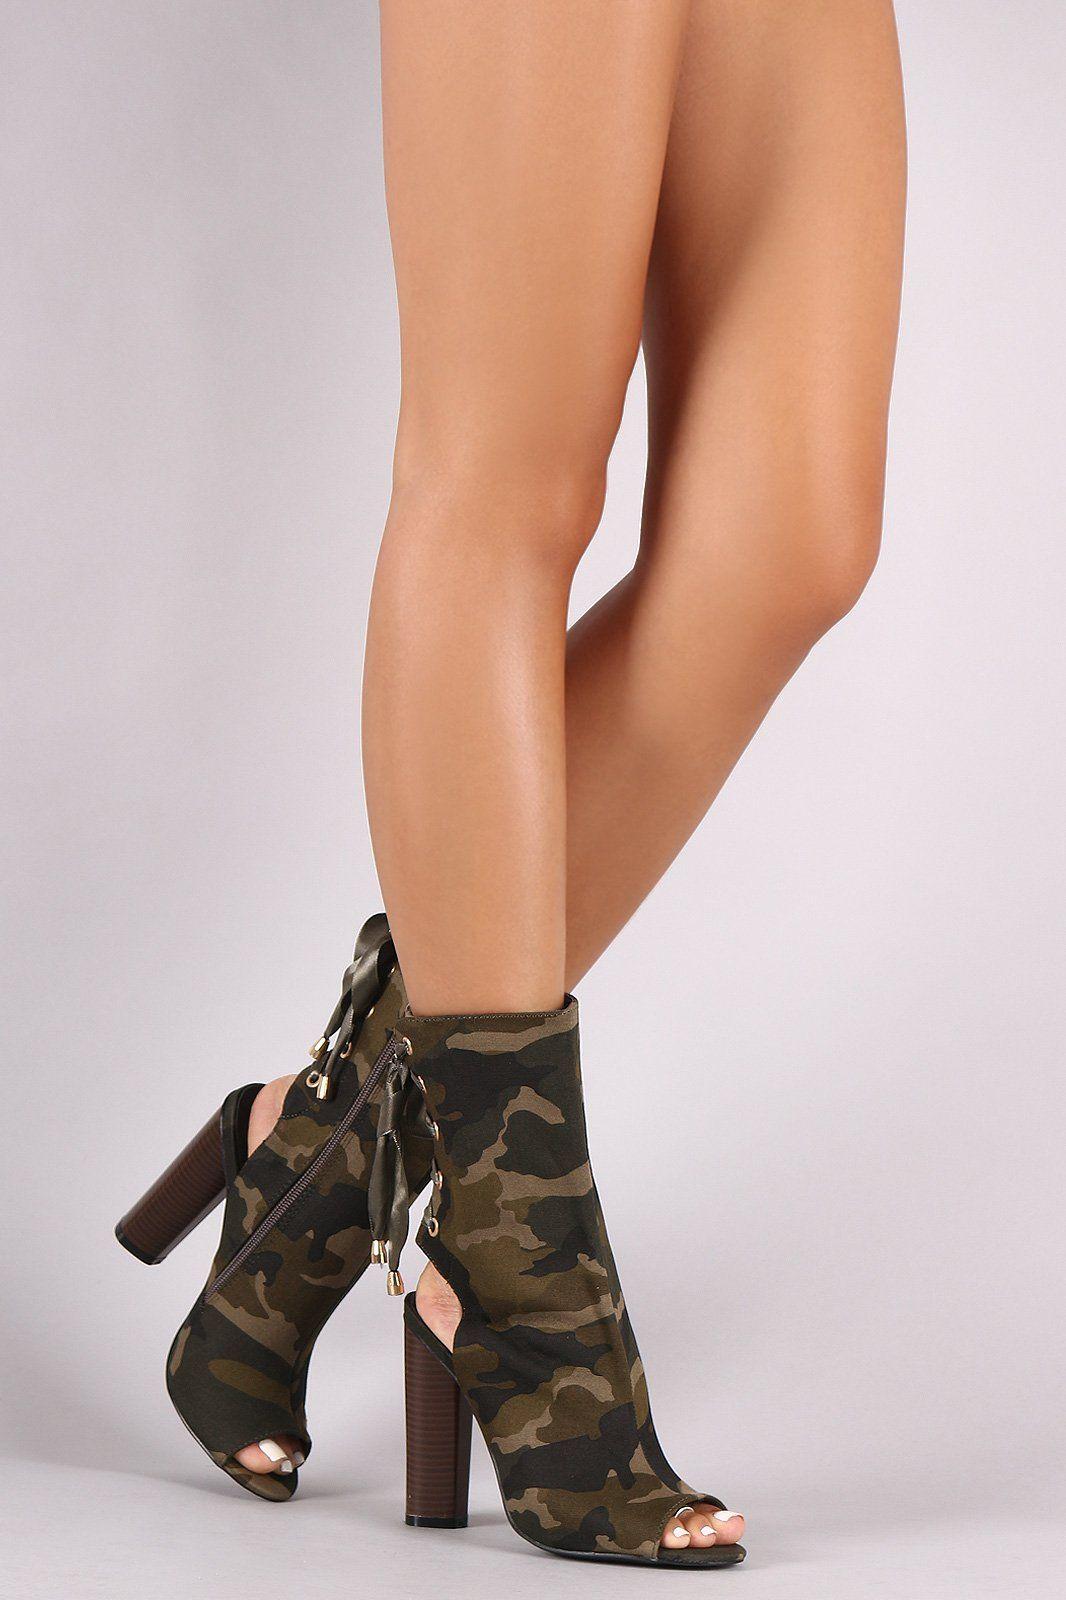 Camouflage Back Lace-Up Chunky Heeled Peep Toe Boots  1ce351453333